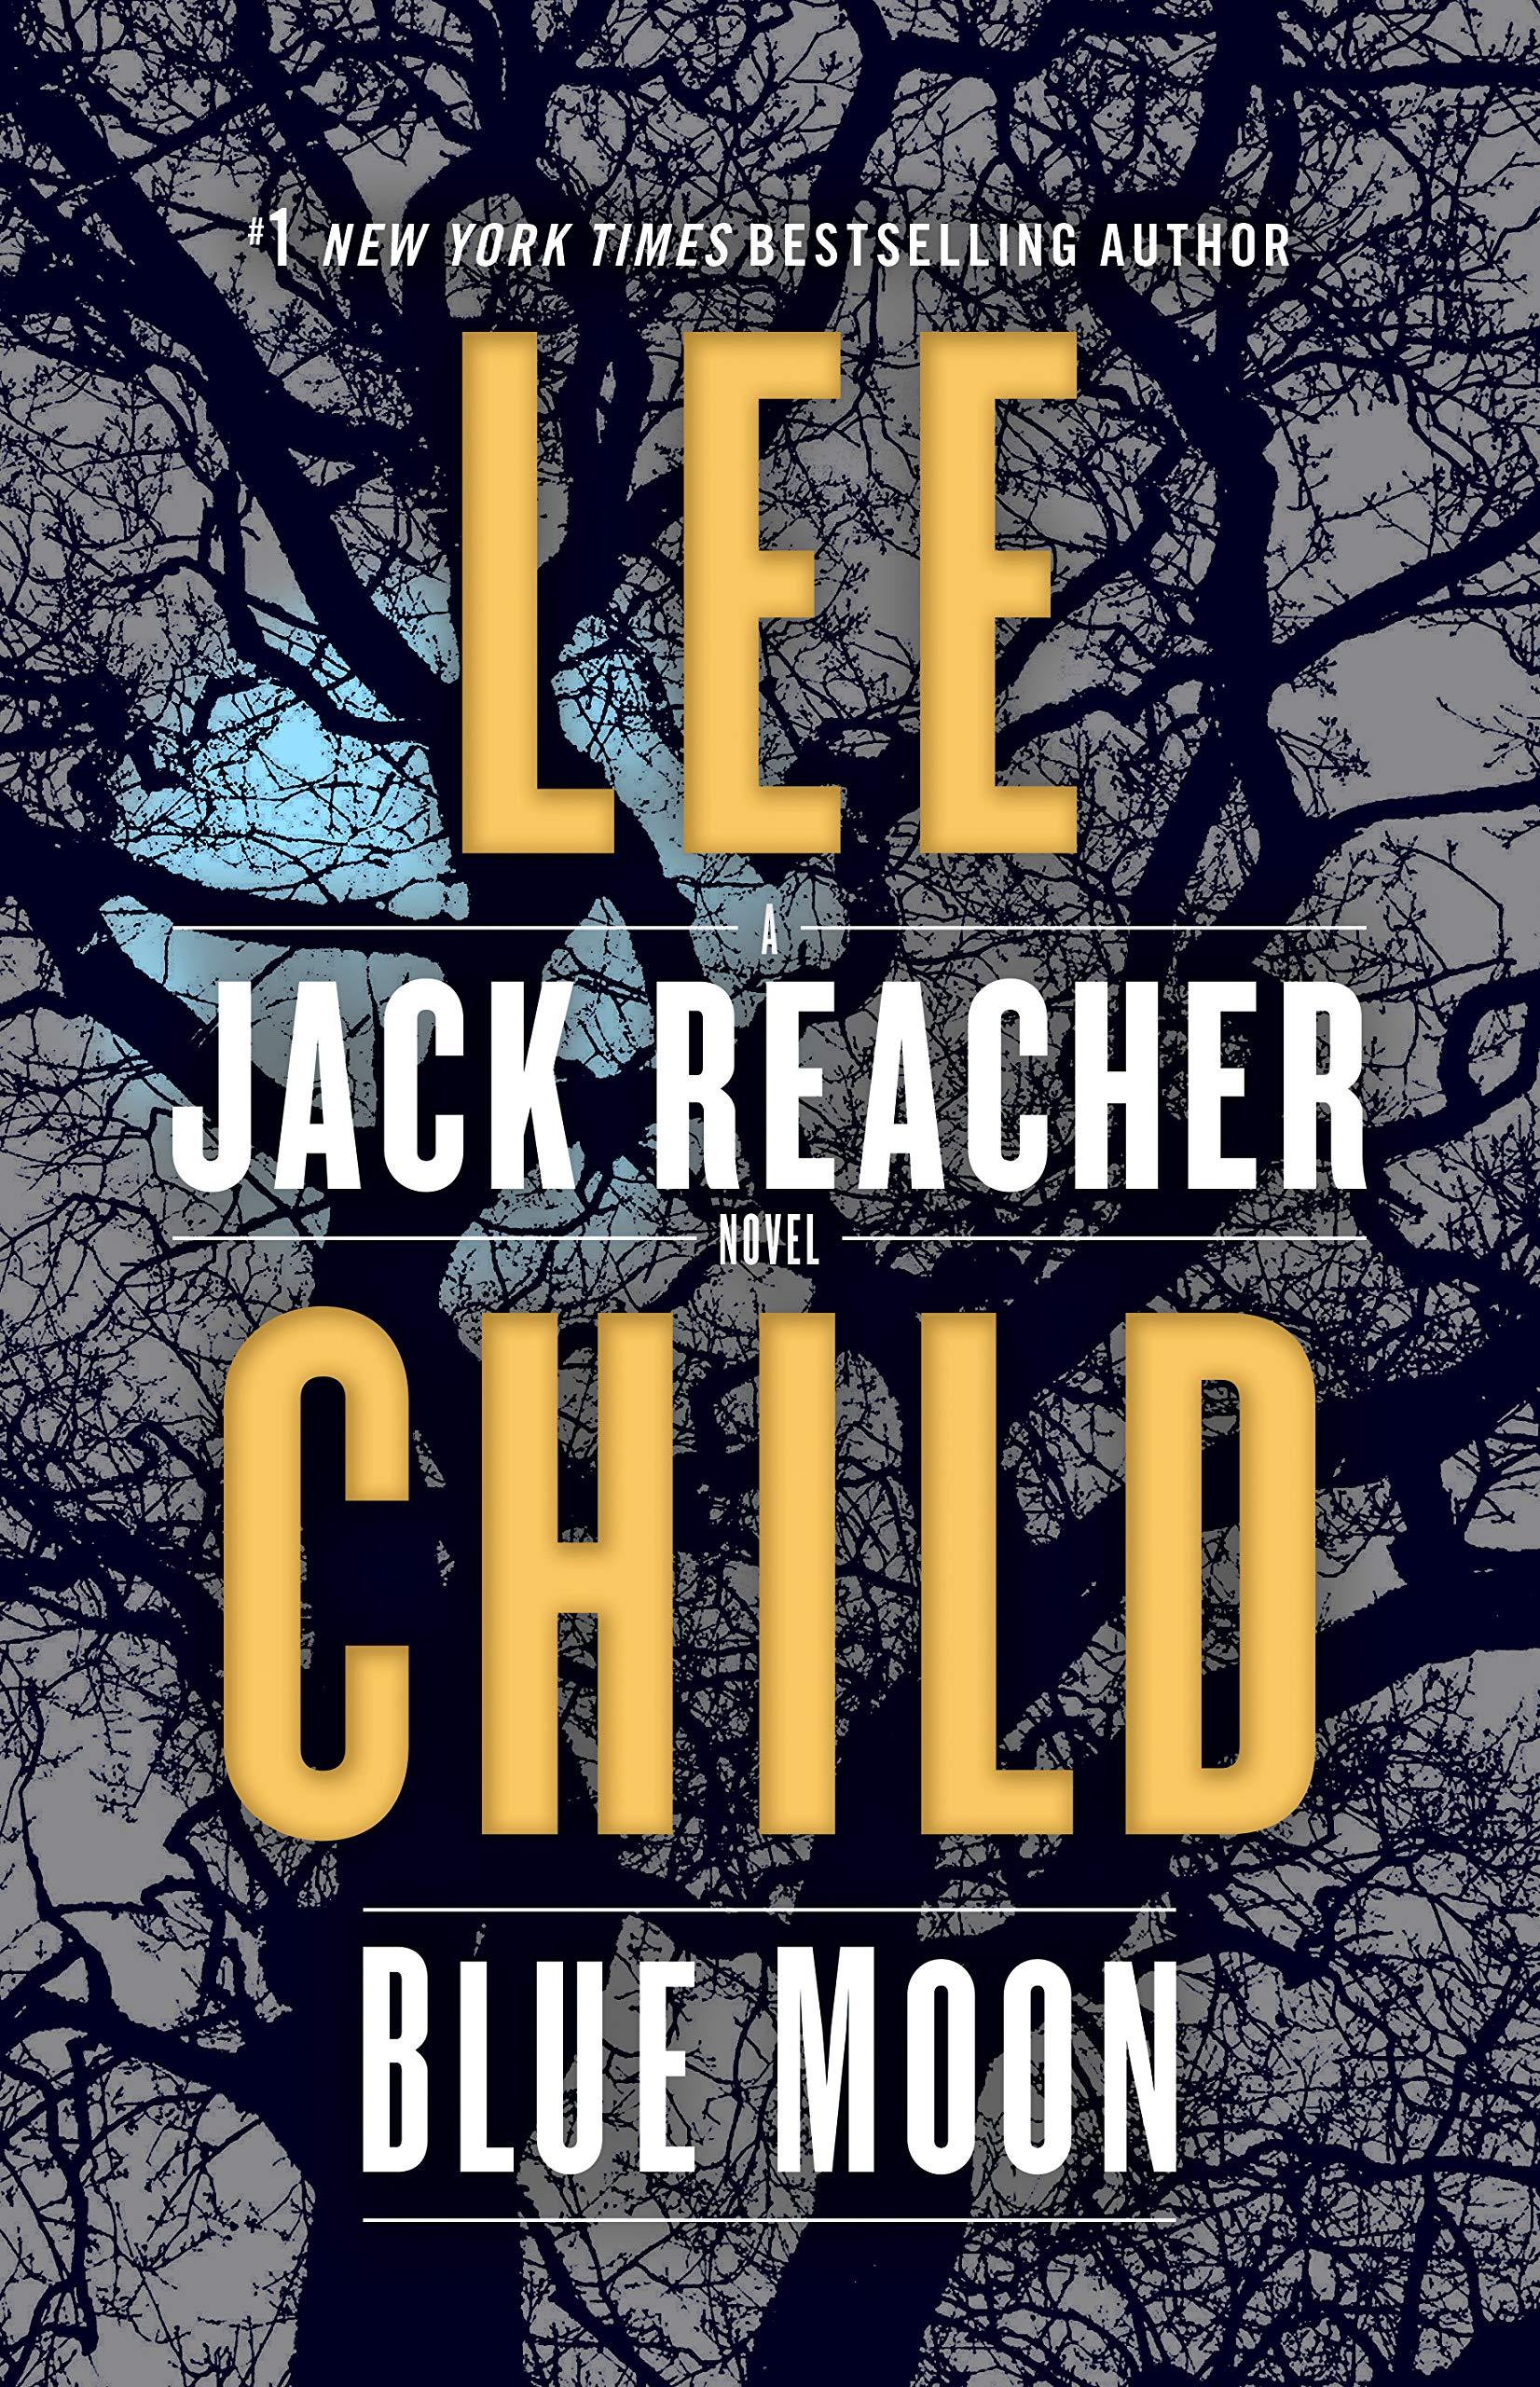 Blue Moon (Jack Reacher)